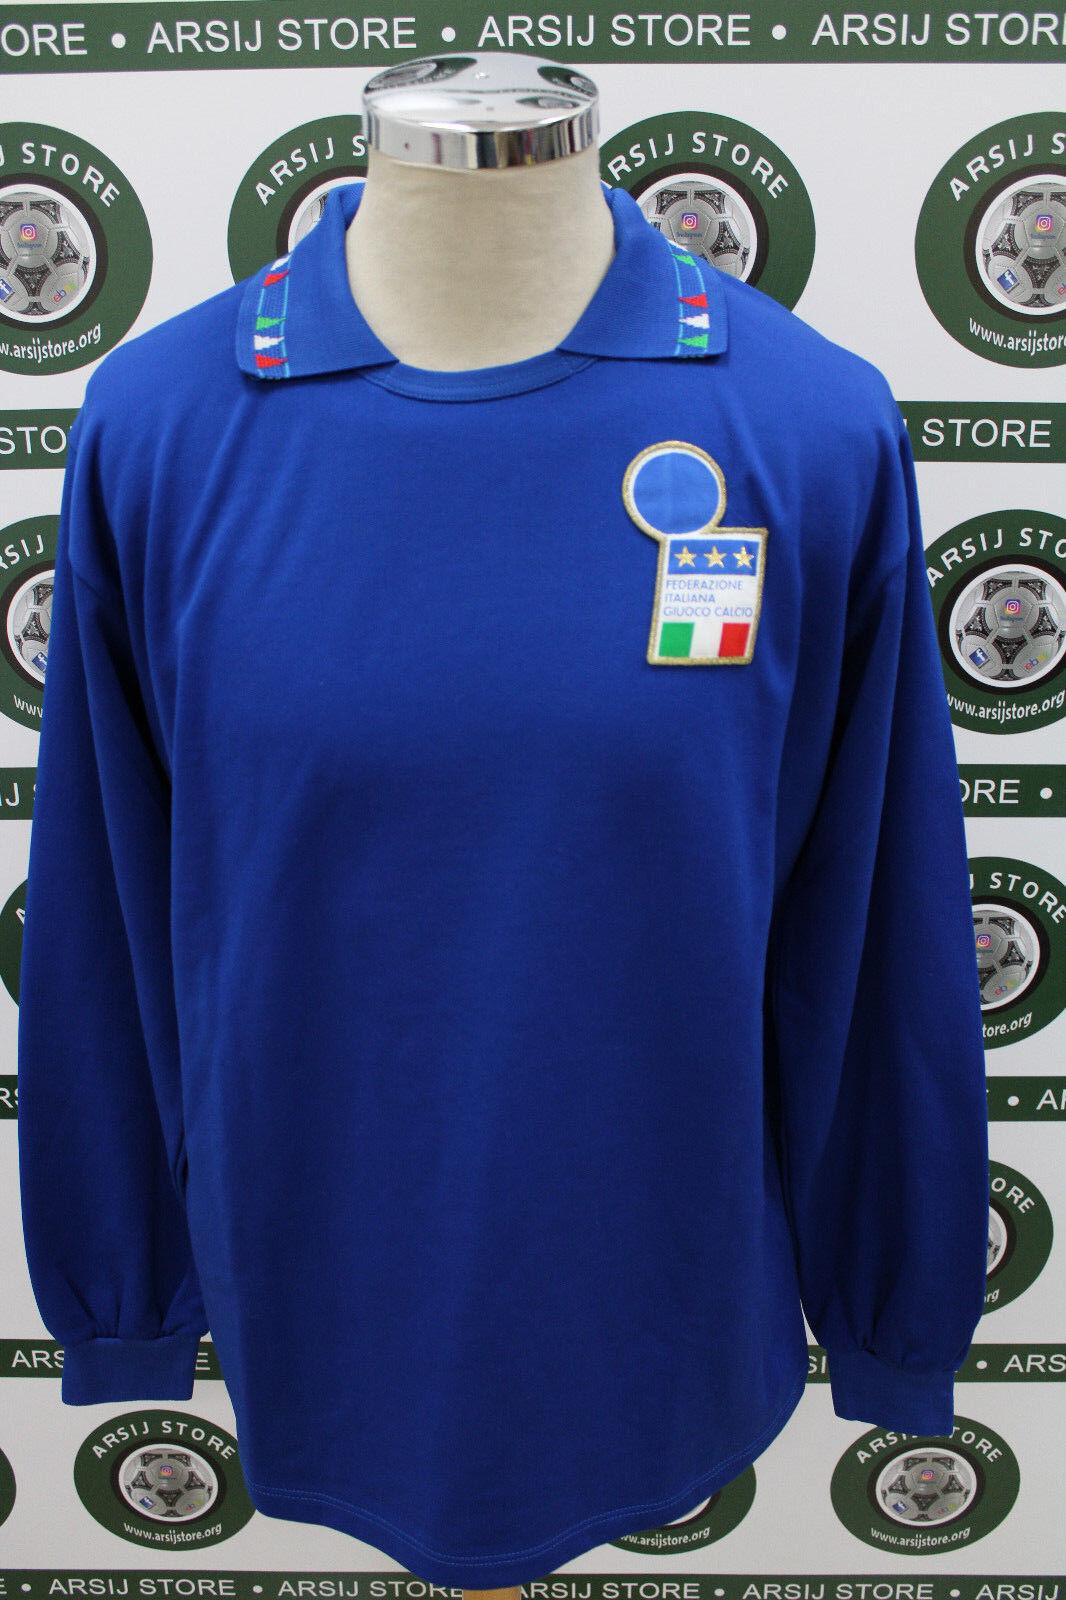 caf4f198df89ac calcio shirt maillot trikot camiseta MATCH WORN Maglia ITALIA noiaoi3968- Calcio